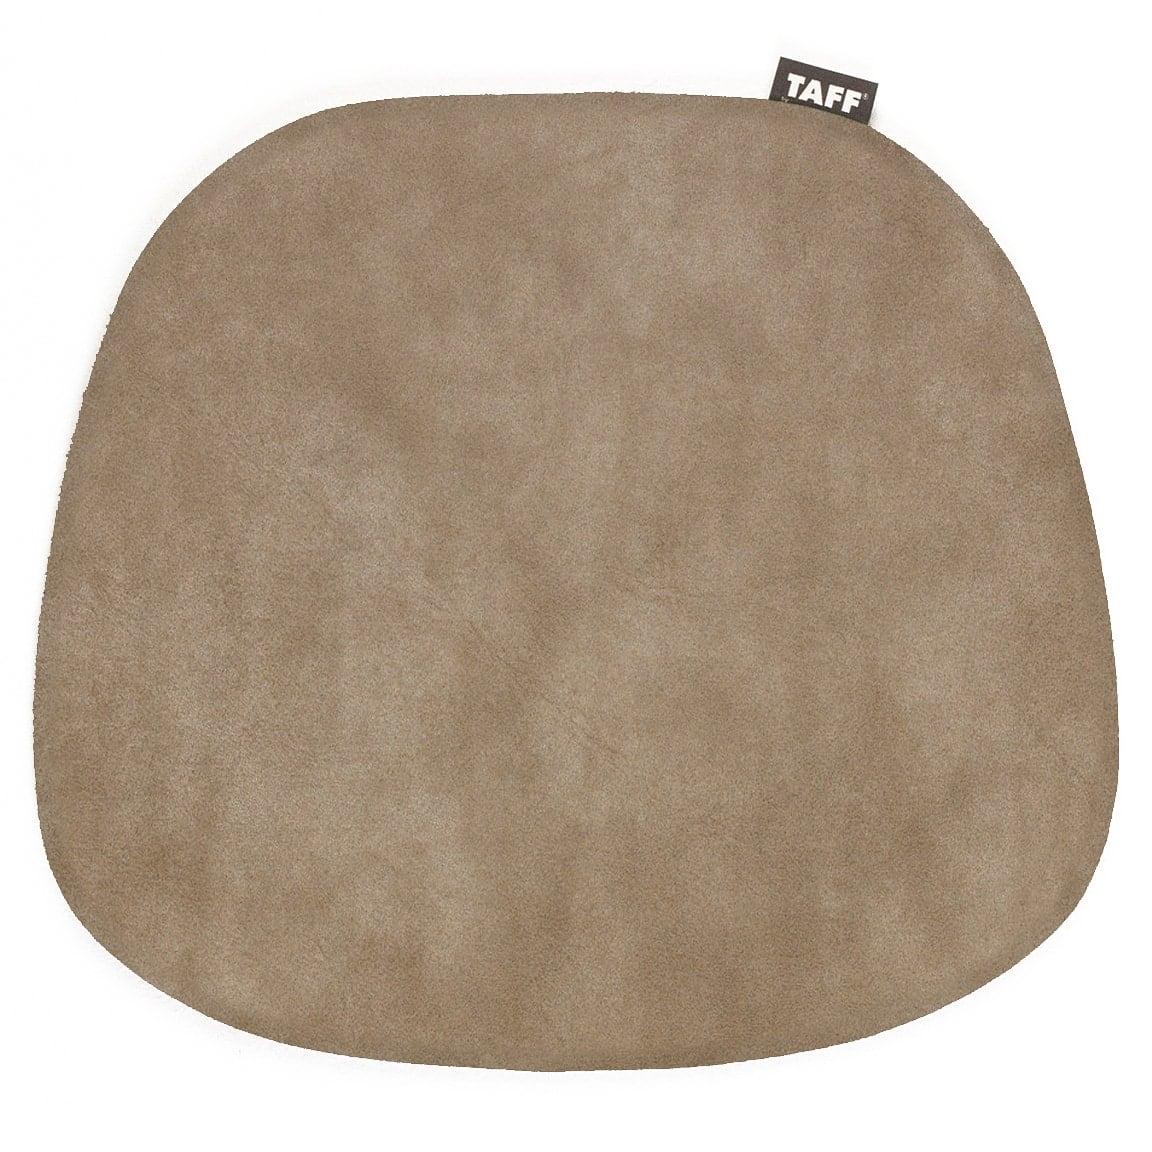 Sitzkissen-Saddle-Leder-Side-Chair-warm-grey